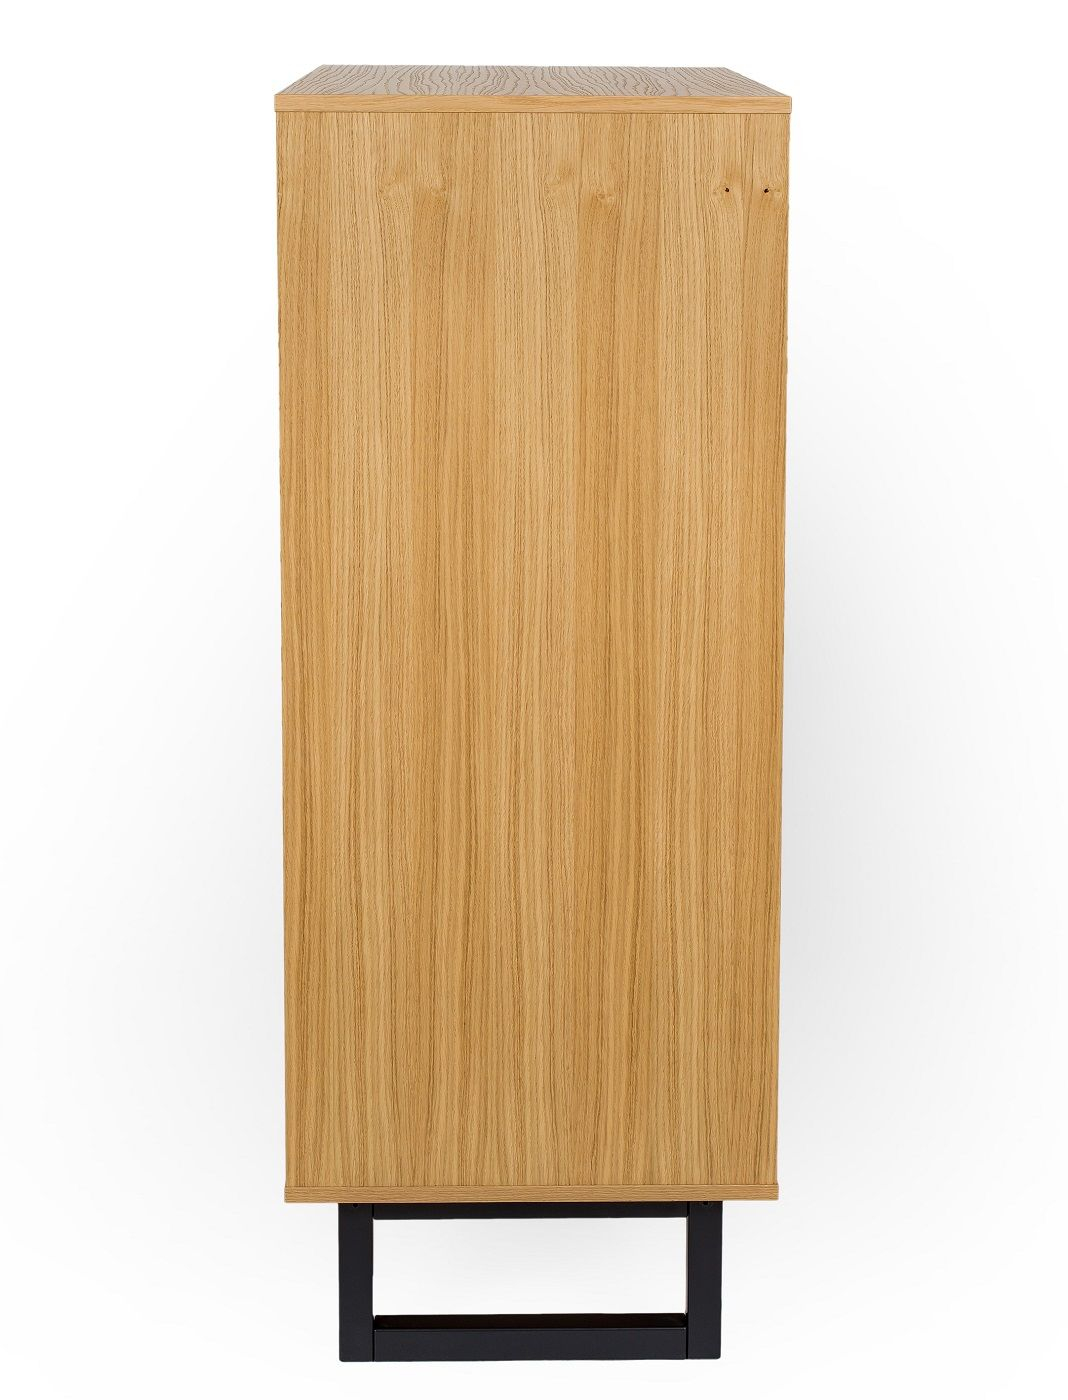 Woodman Camden Kommode - Eg/Herringbone Print, 80x48